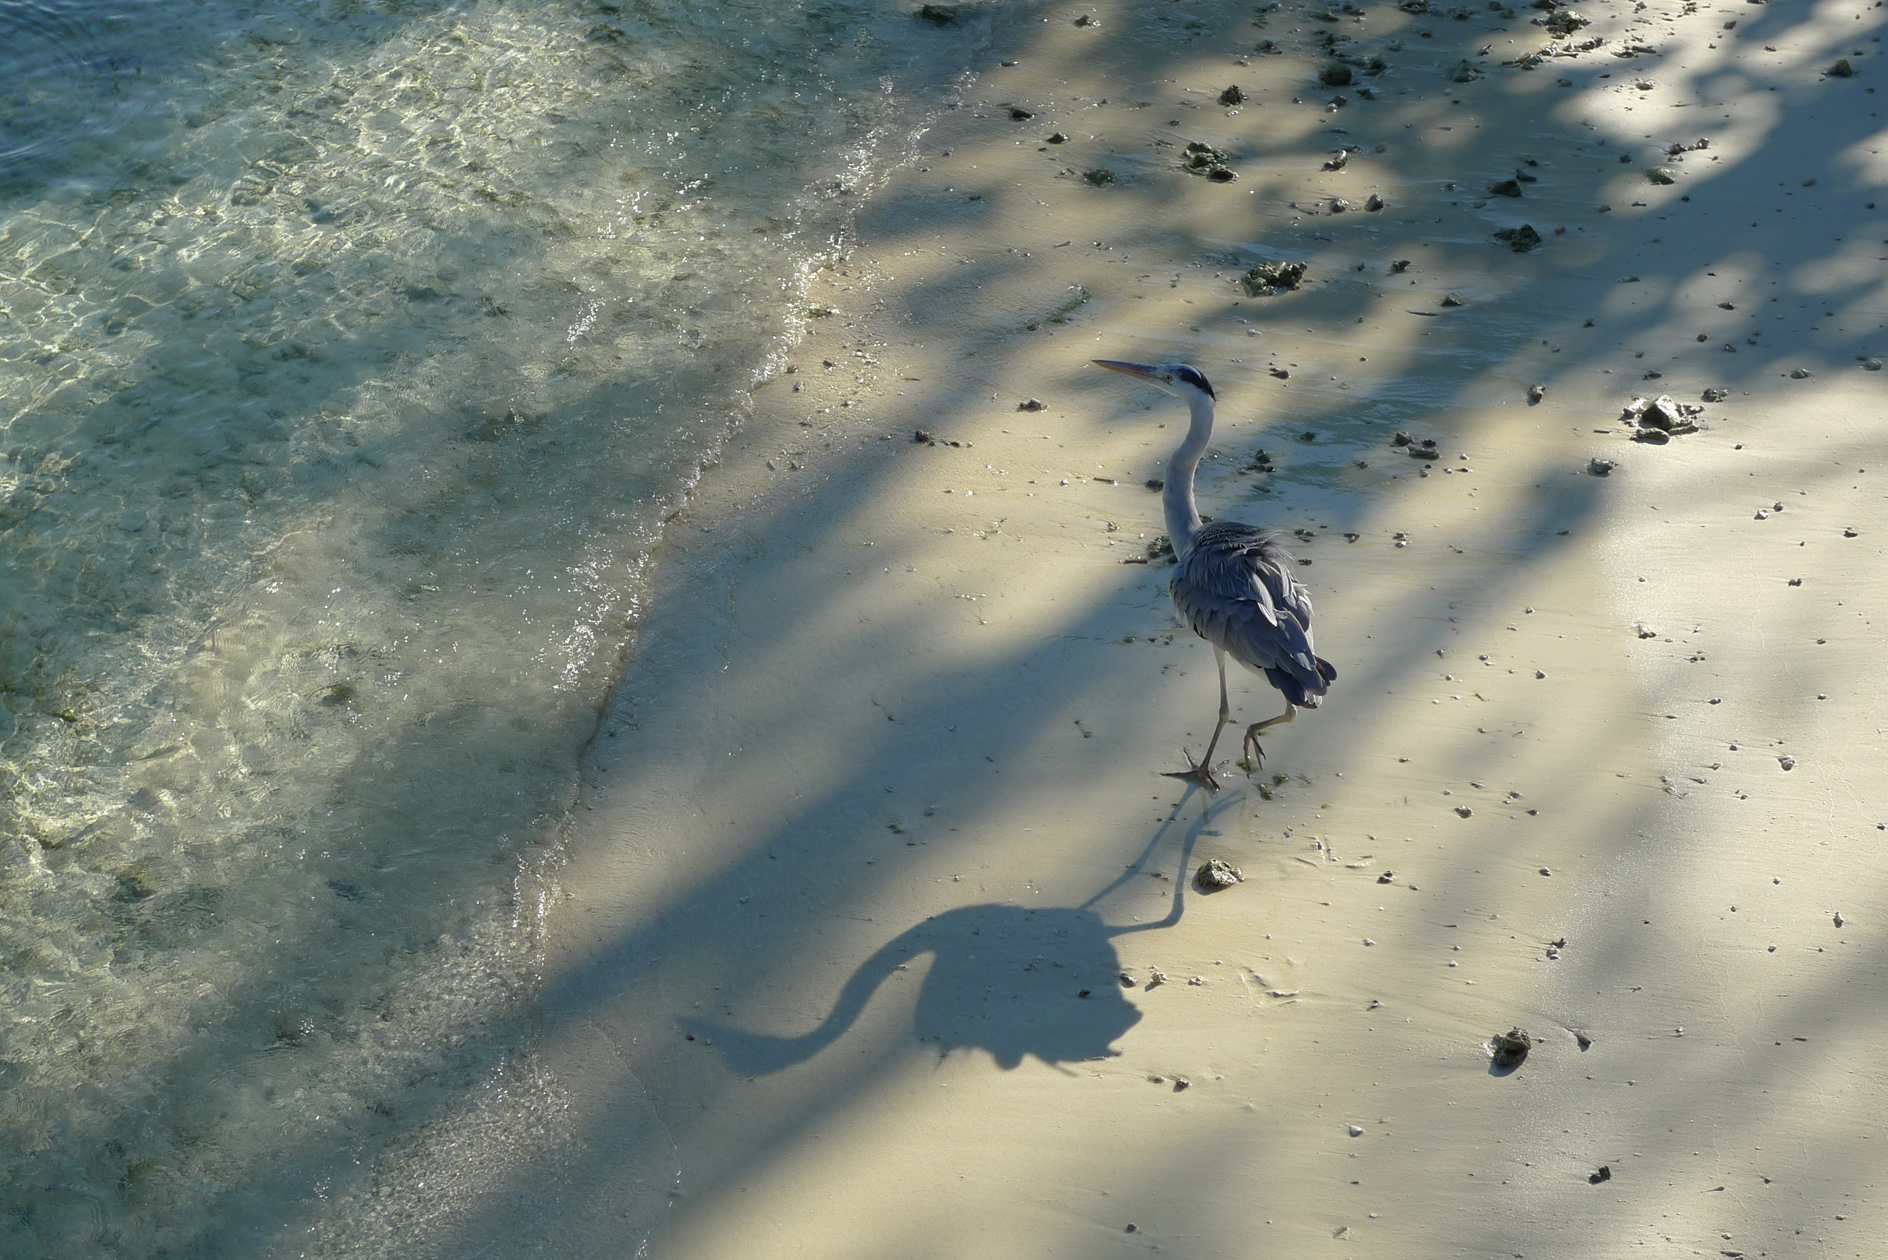 Heron casting shadow